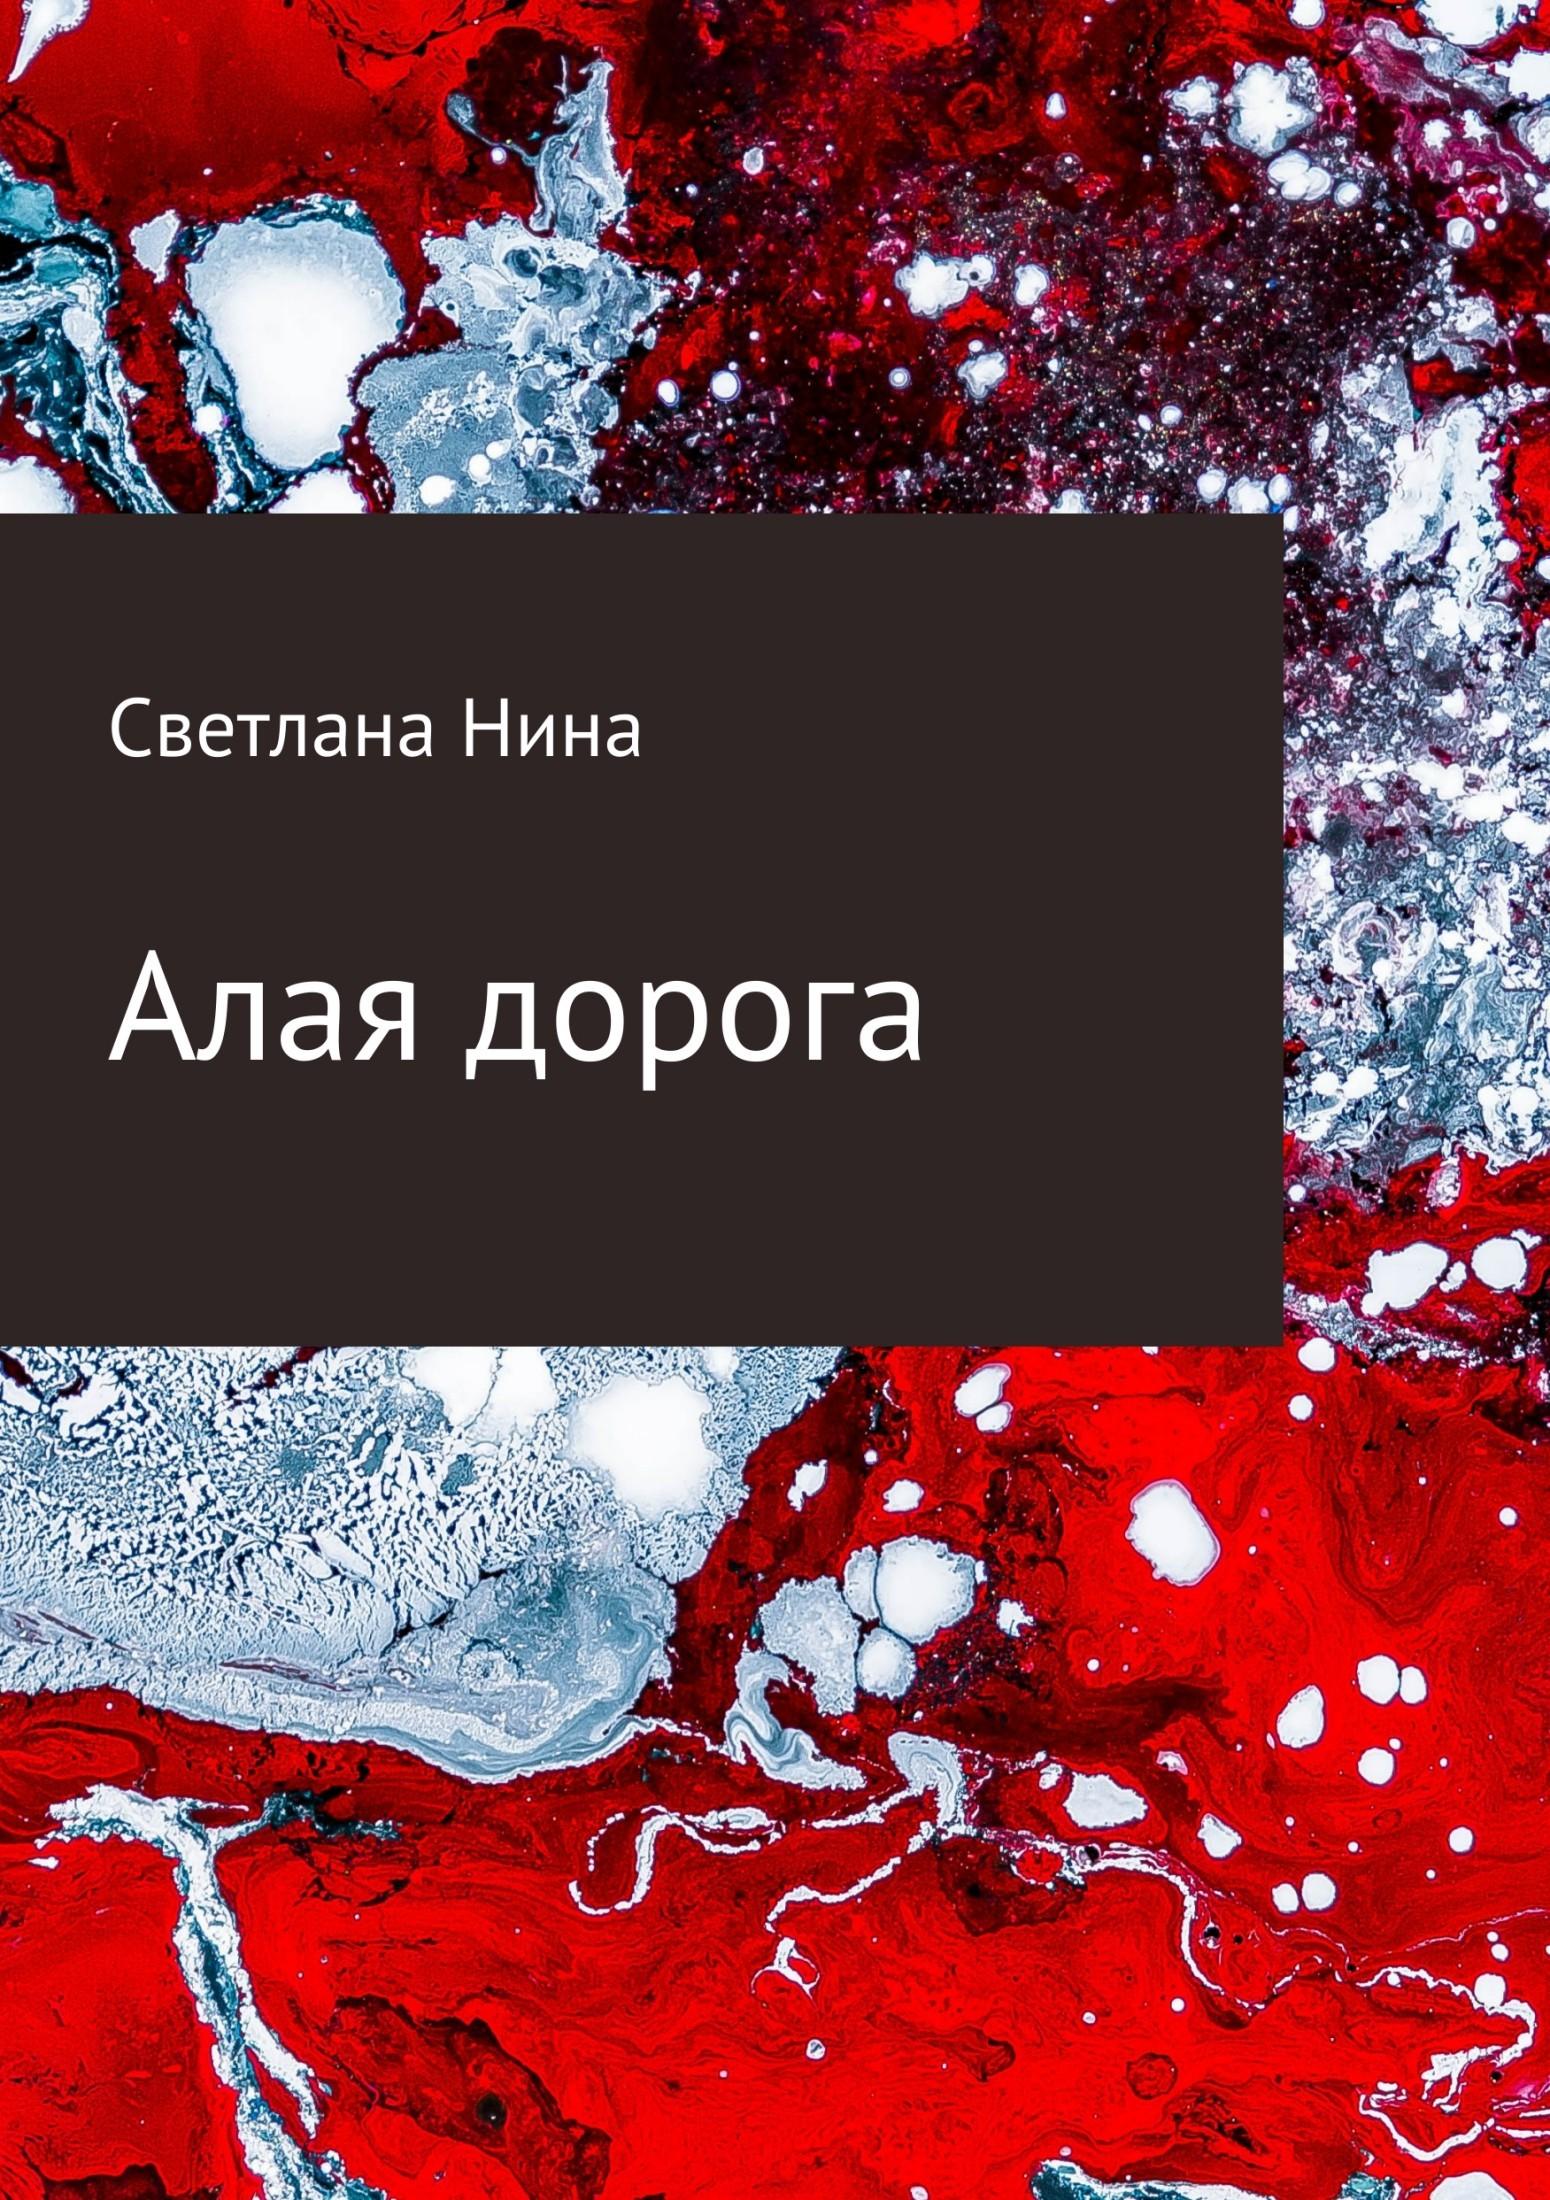 Светлана Нина - Алая дорога